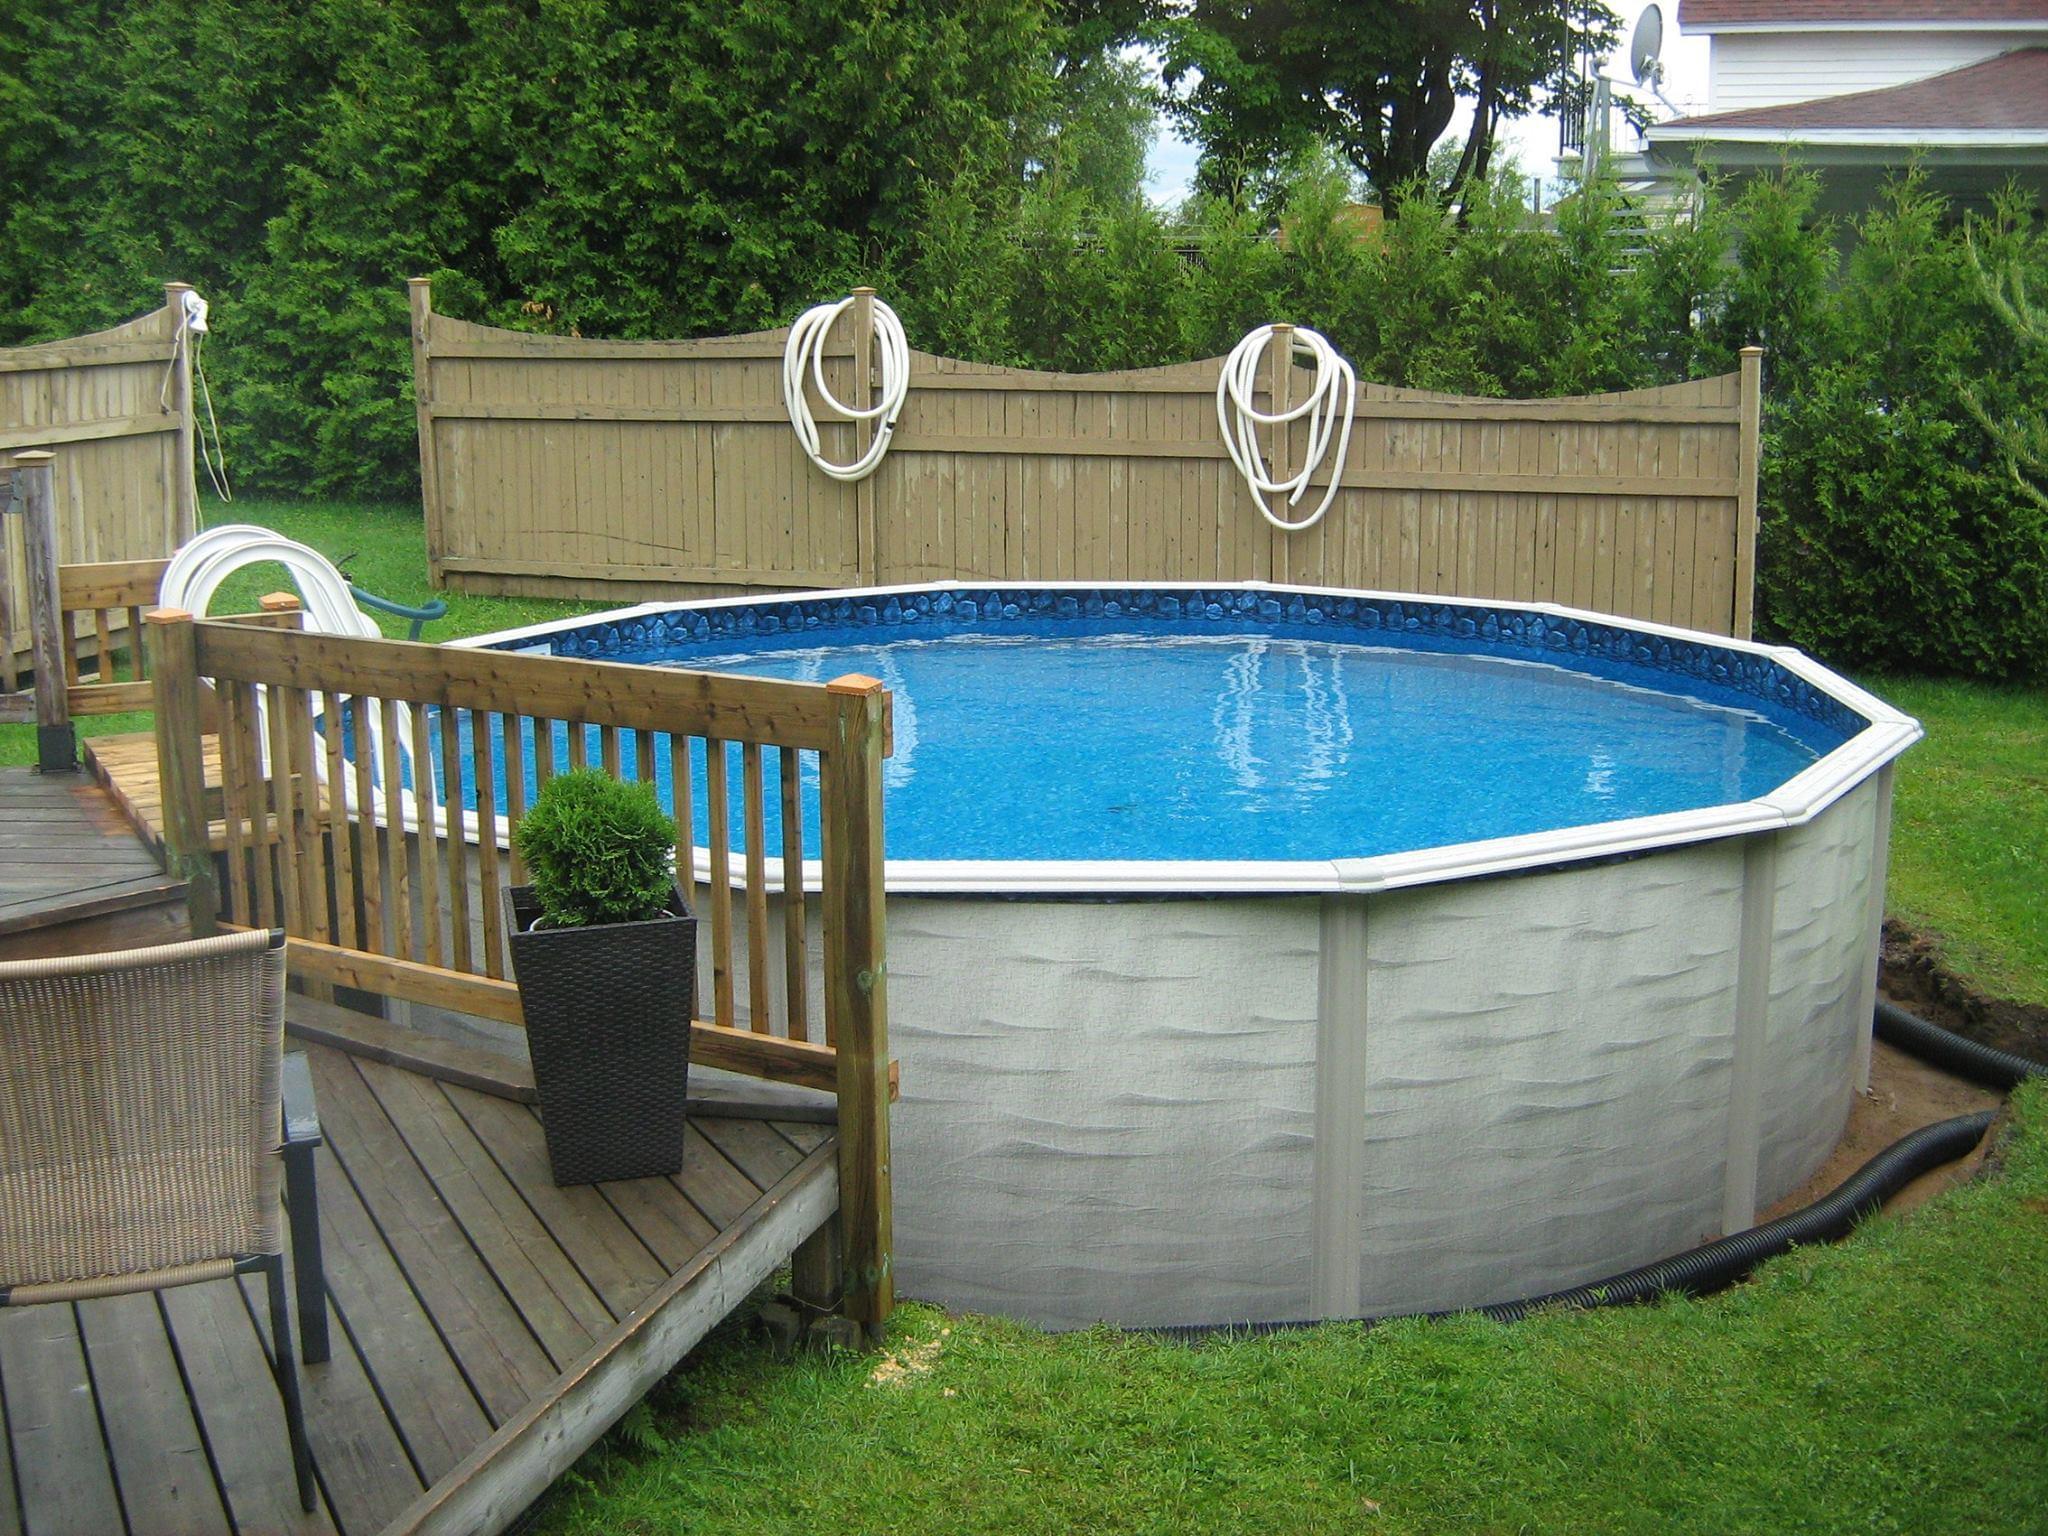 Evolution 27 pied ronde piscine hor magasin de piscine for Chauffe eau piscine hors terre prix